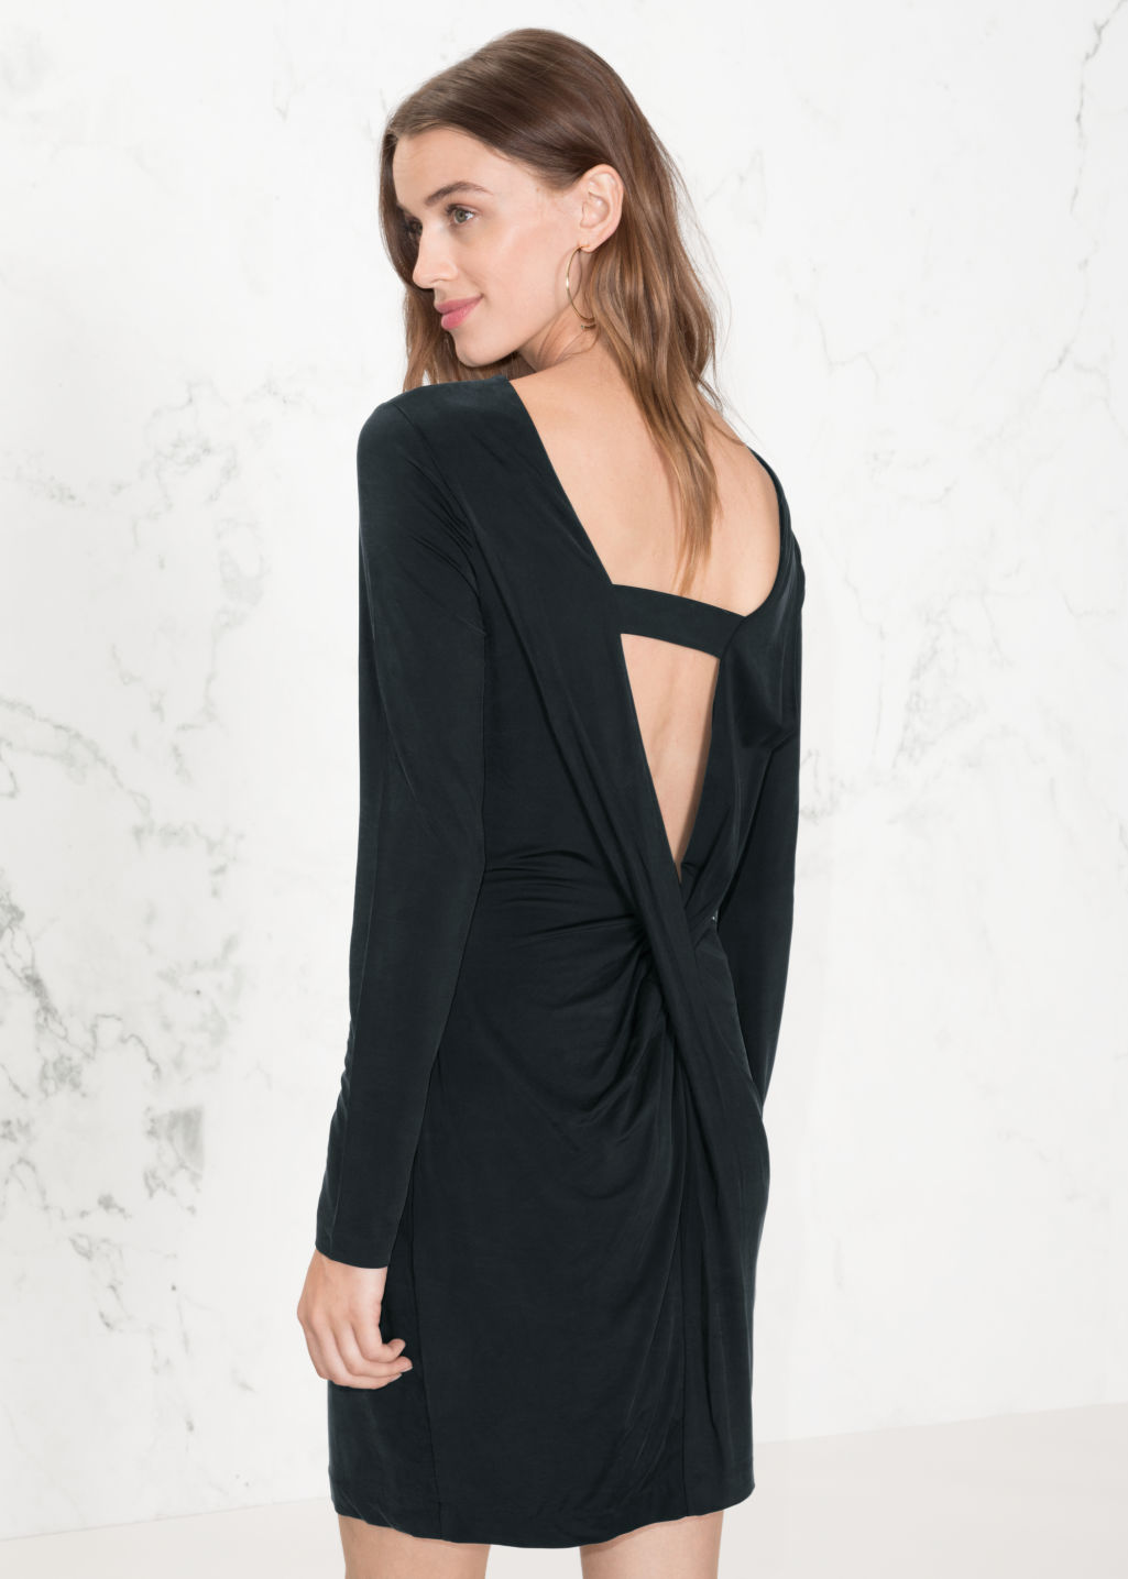 922e773c85 open back dress black – Little Black Dress | Black Lace Bridesmaid ...